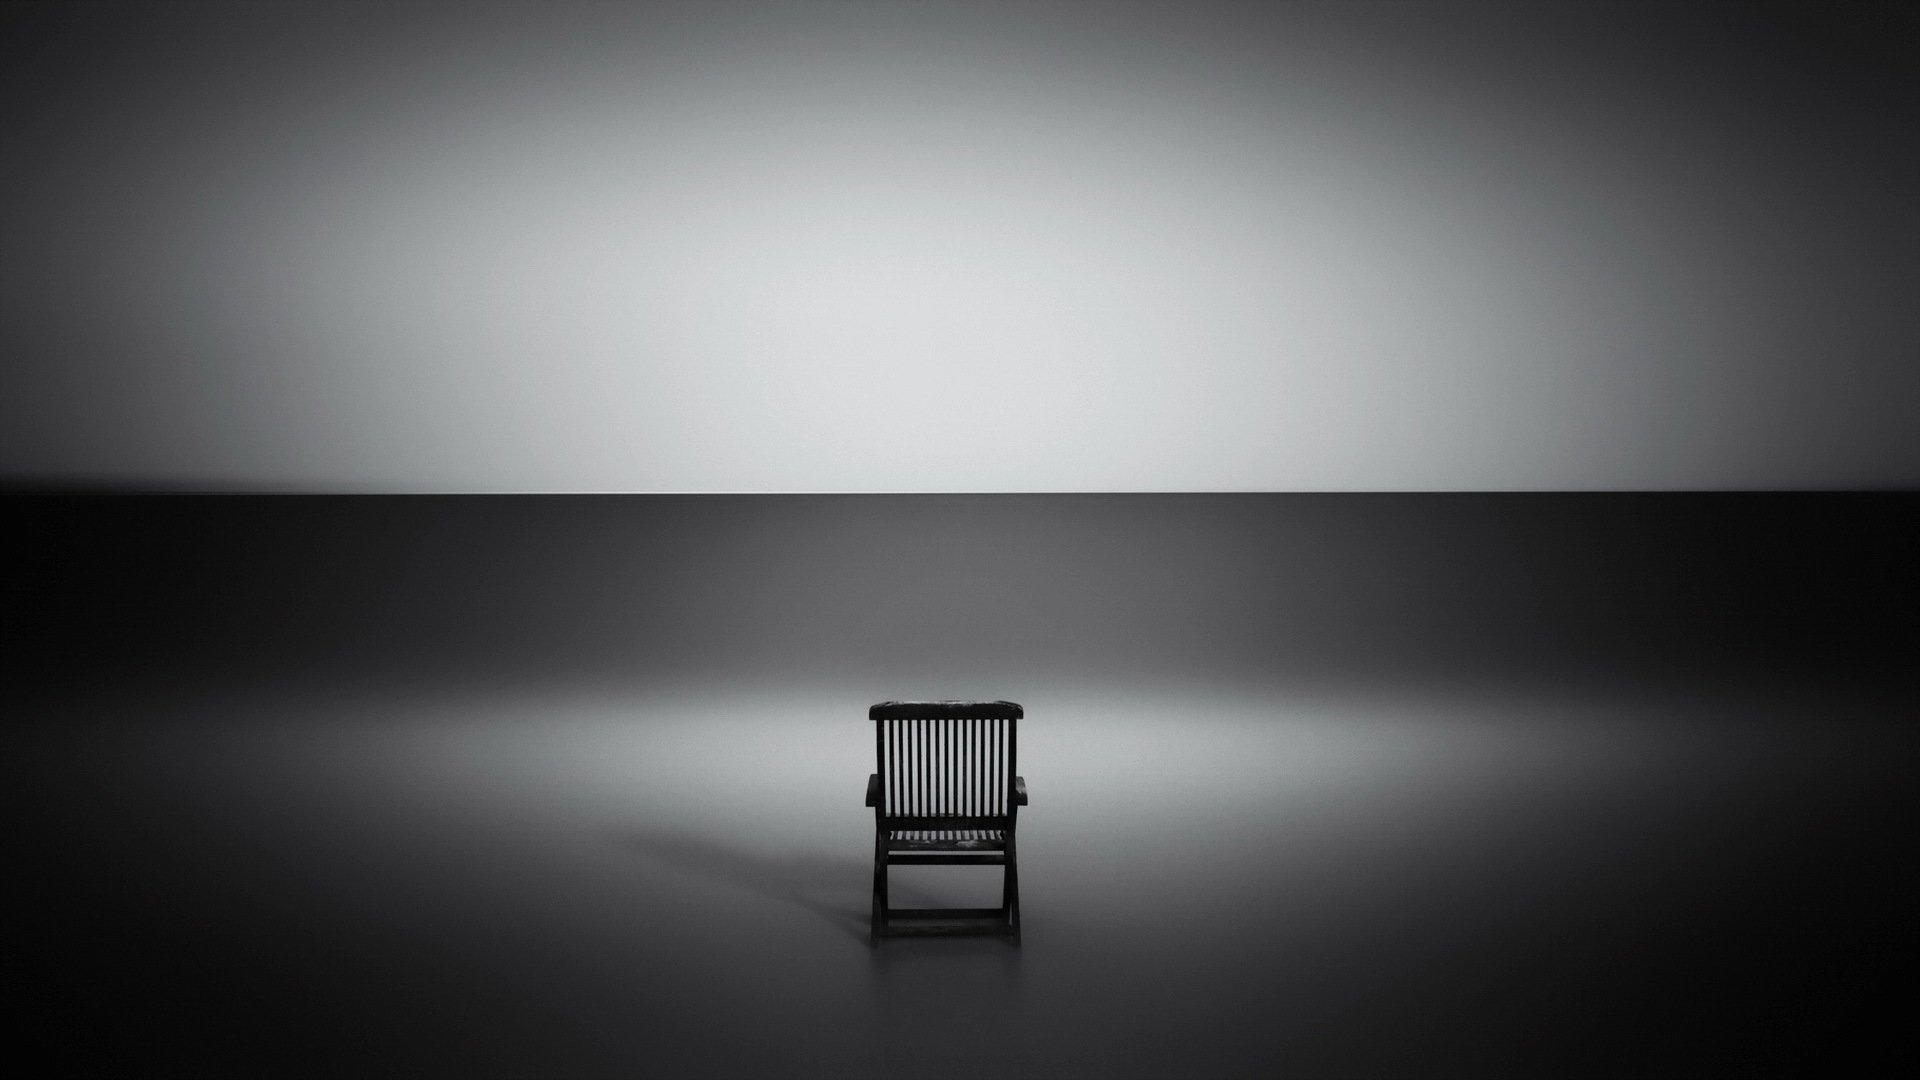 дома минимализм тень home minimalism shadow бесплатно